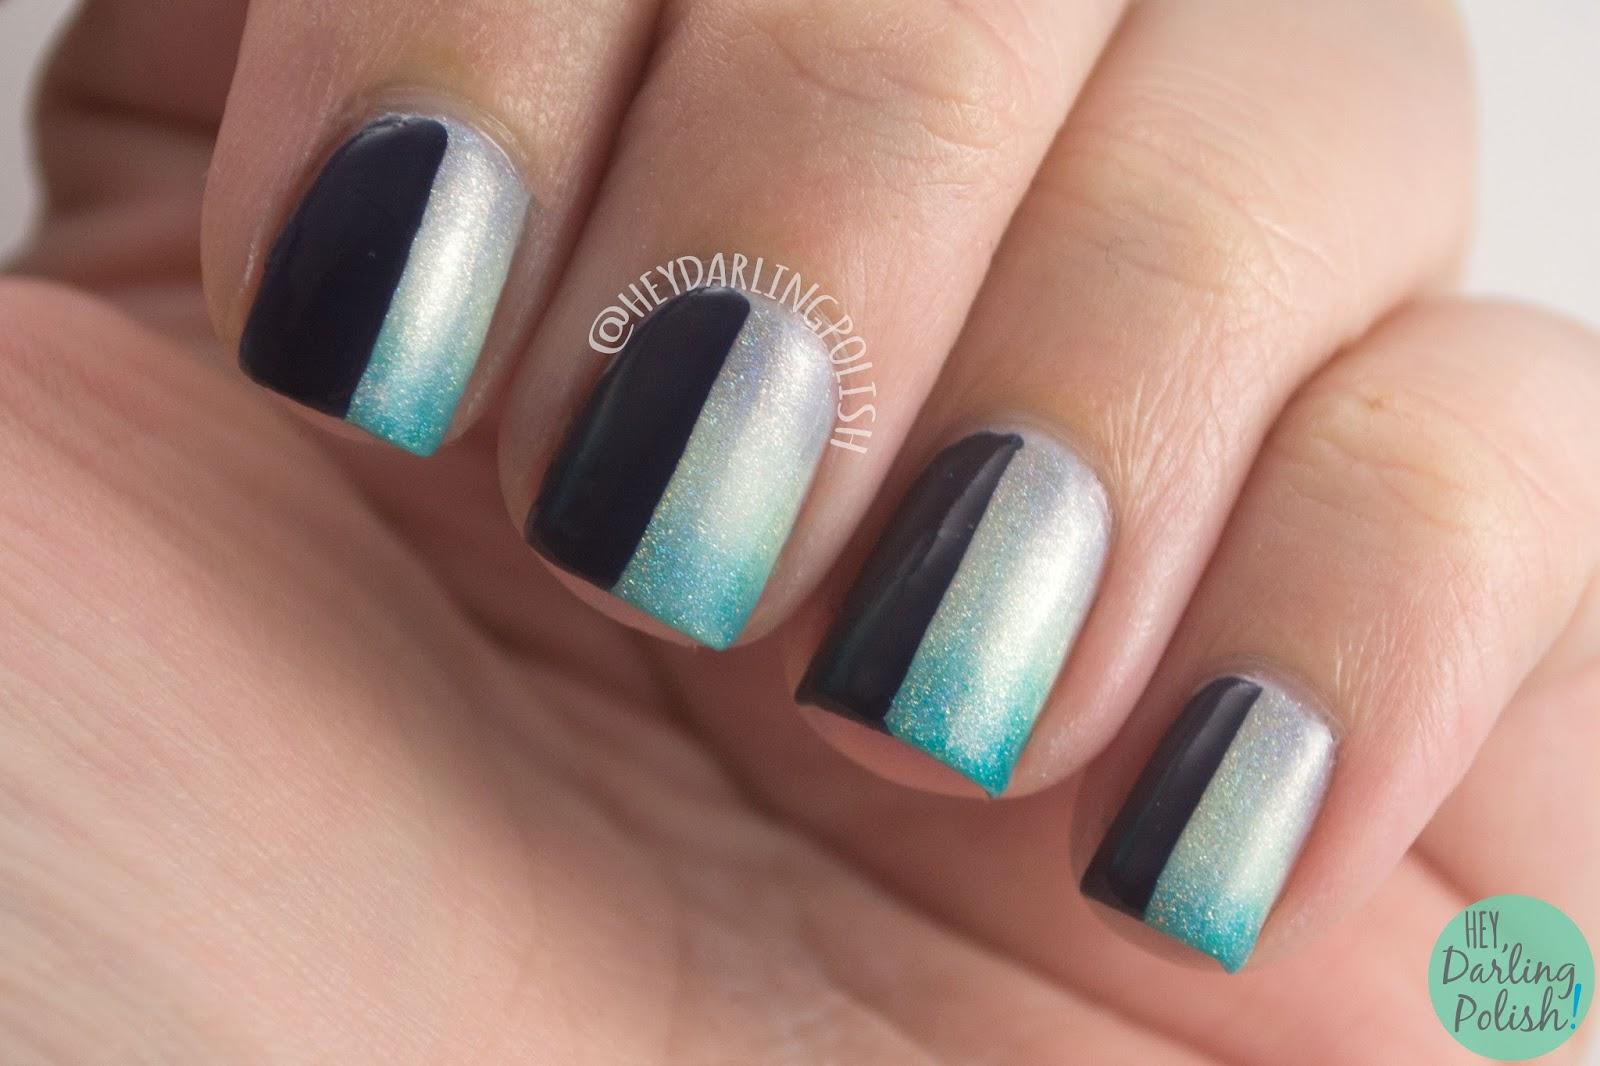 fairy godmother, gradient,green, holo, grey, blue, nails, nail art, nail polish, indie polish, fair maiden polish, hey darling polish,